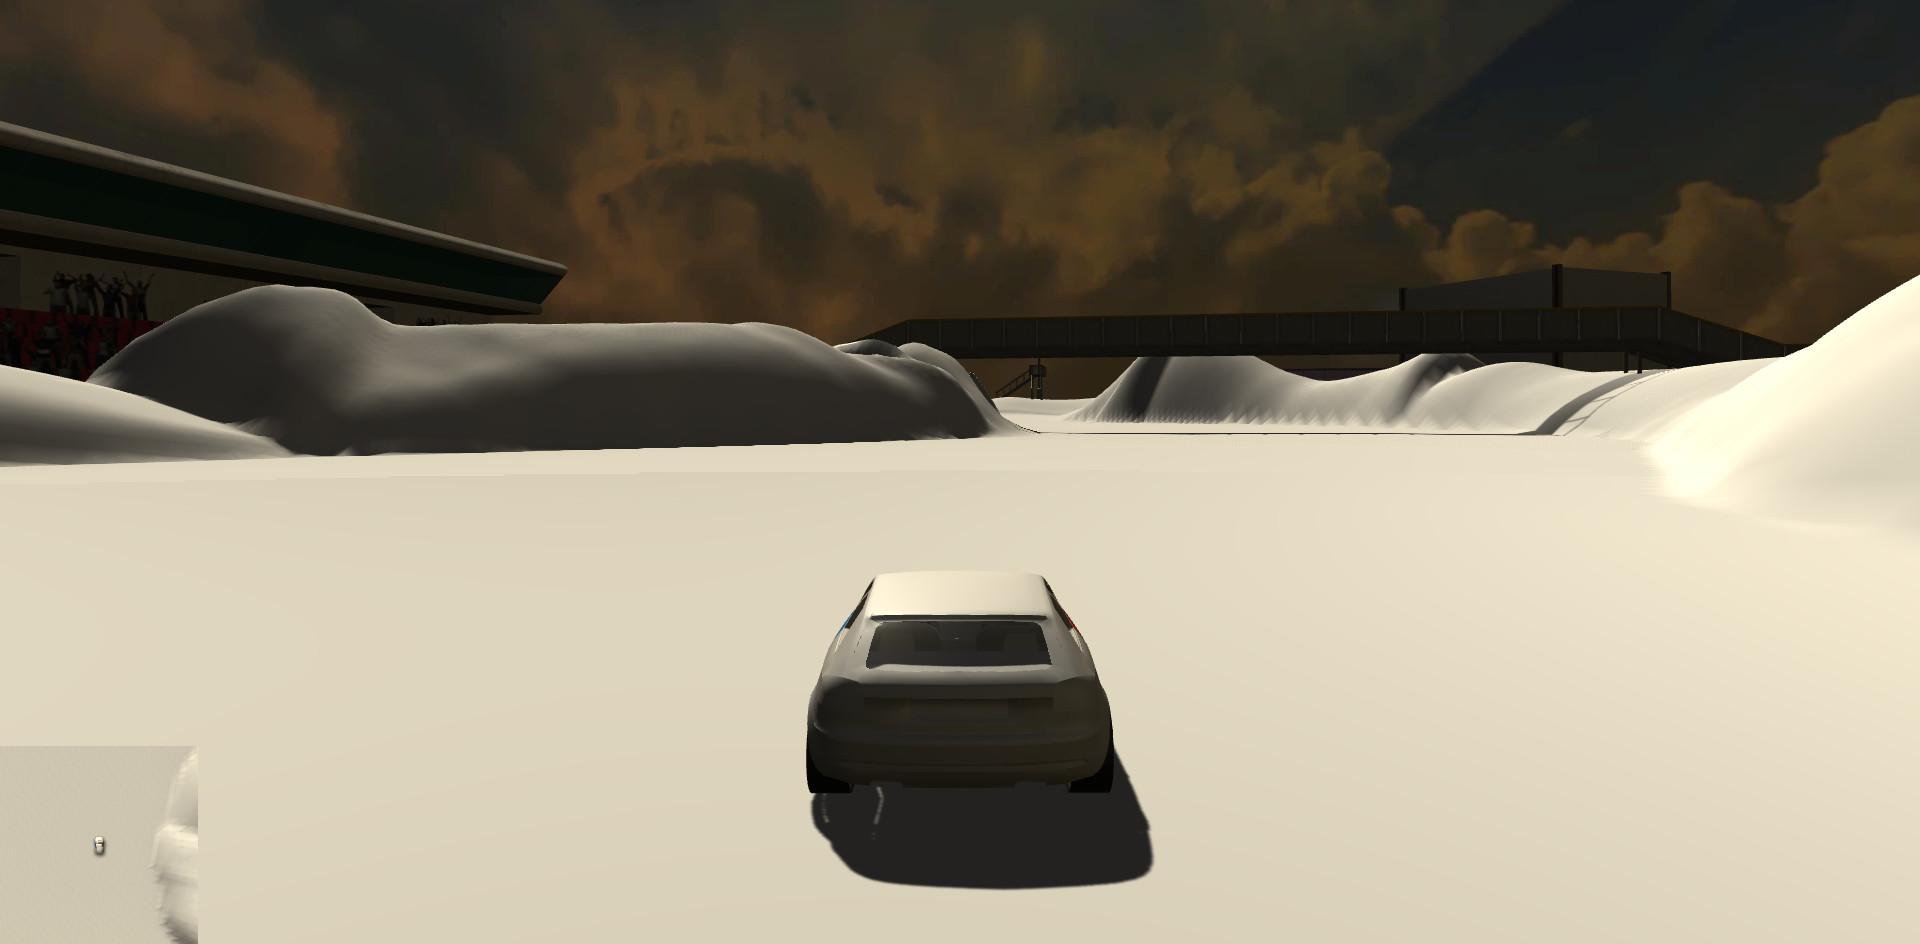 Race On Ice 2021 Pro screenshot